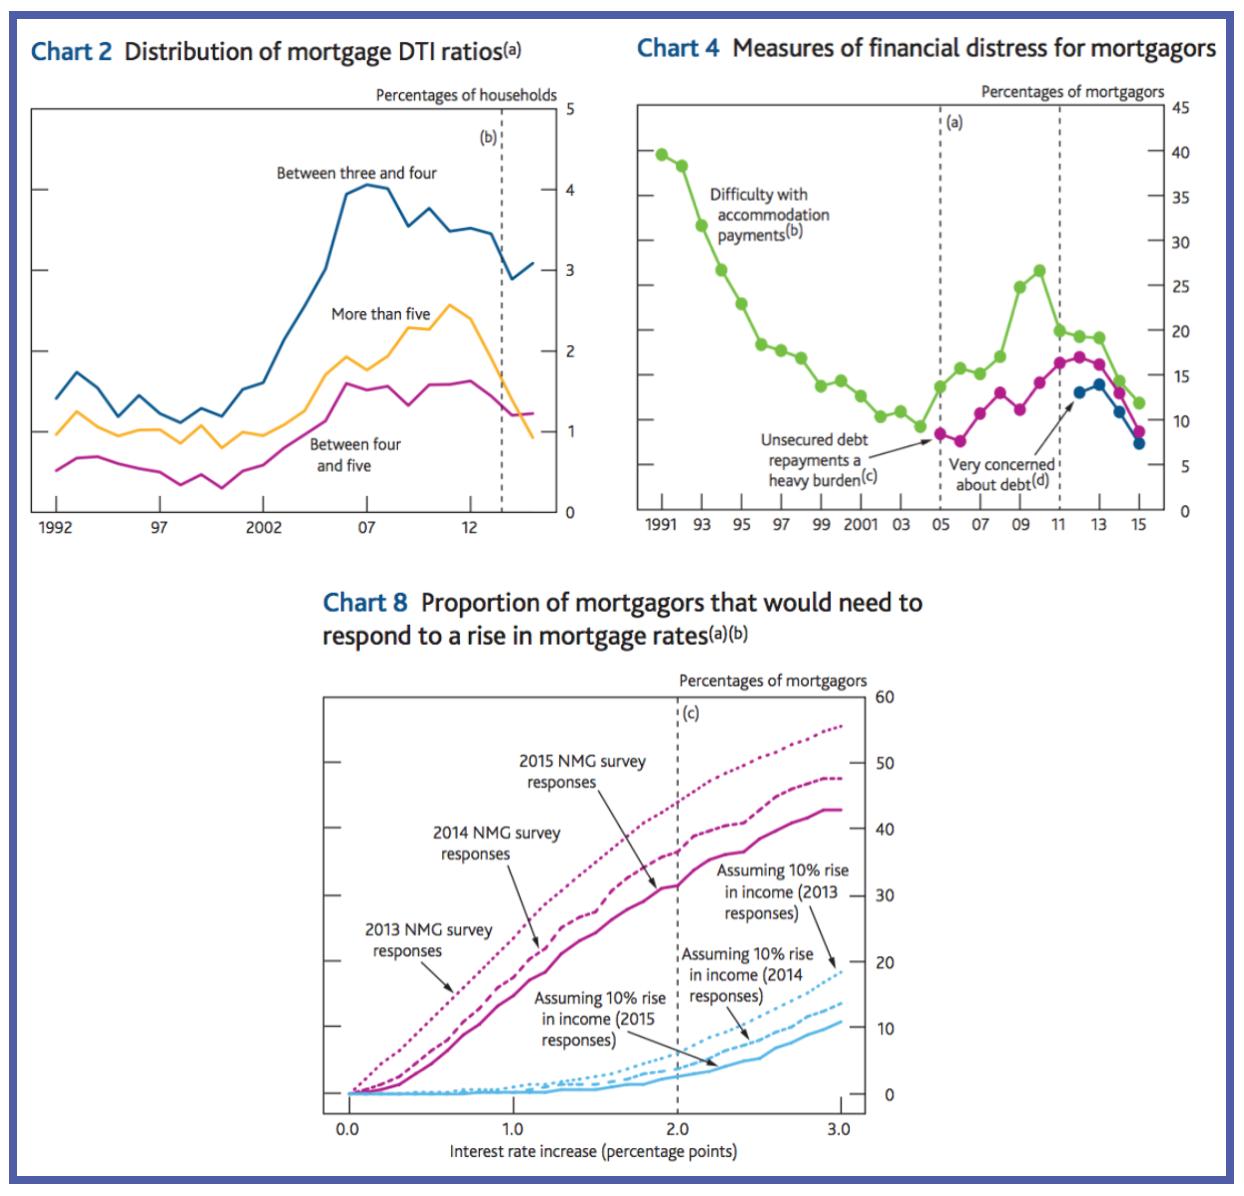 UK_Mortgagors_Respond_Mortgage_Rates